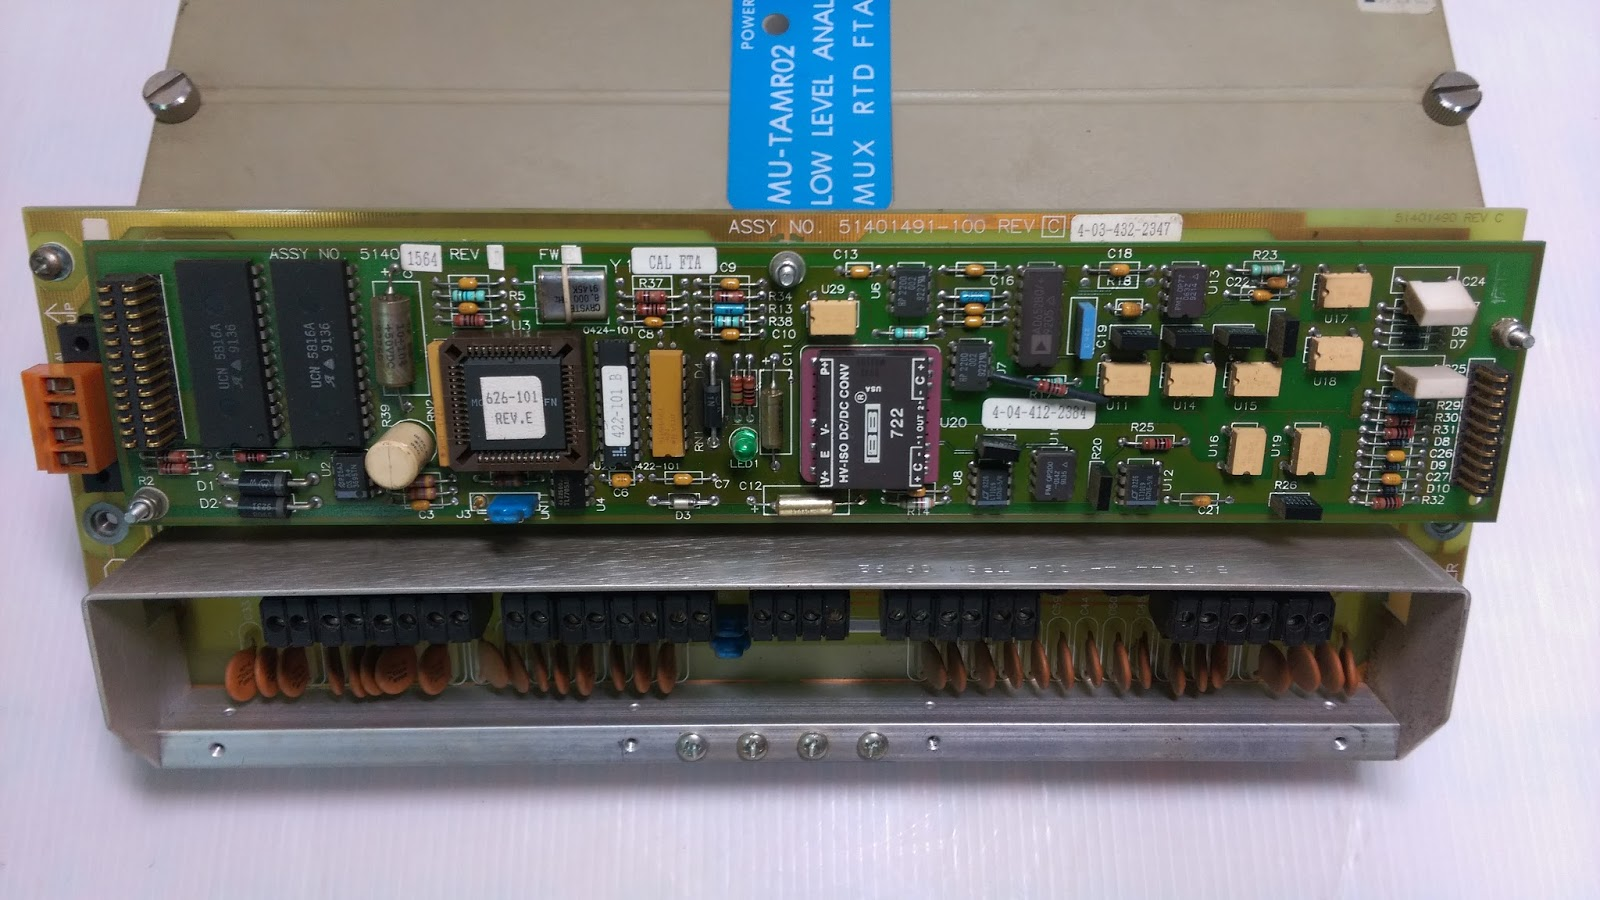 Honeywell TDC3000 Special Reports(2):MU-TAMR02 51304477-100/51304453-100/51304467-100/51304544-100/Iomega Z100SI/Cheetah ST373455LW/Seagate ...